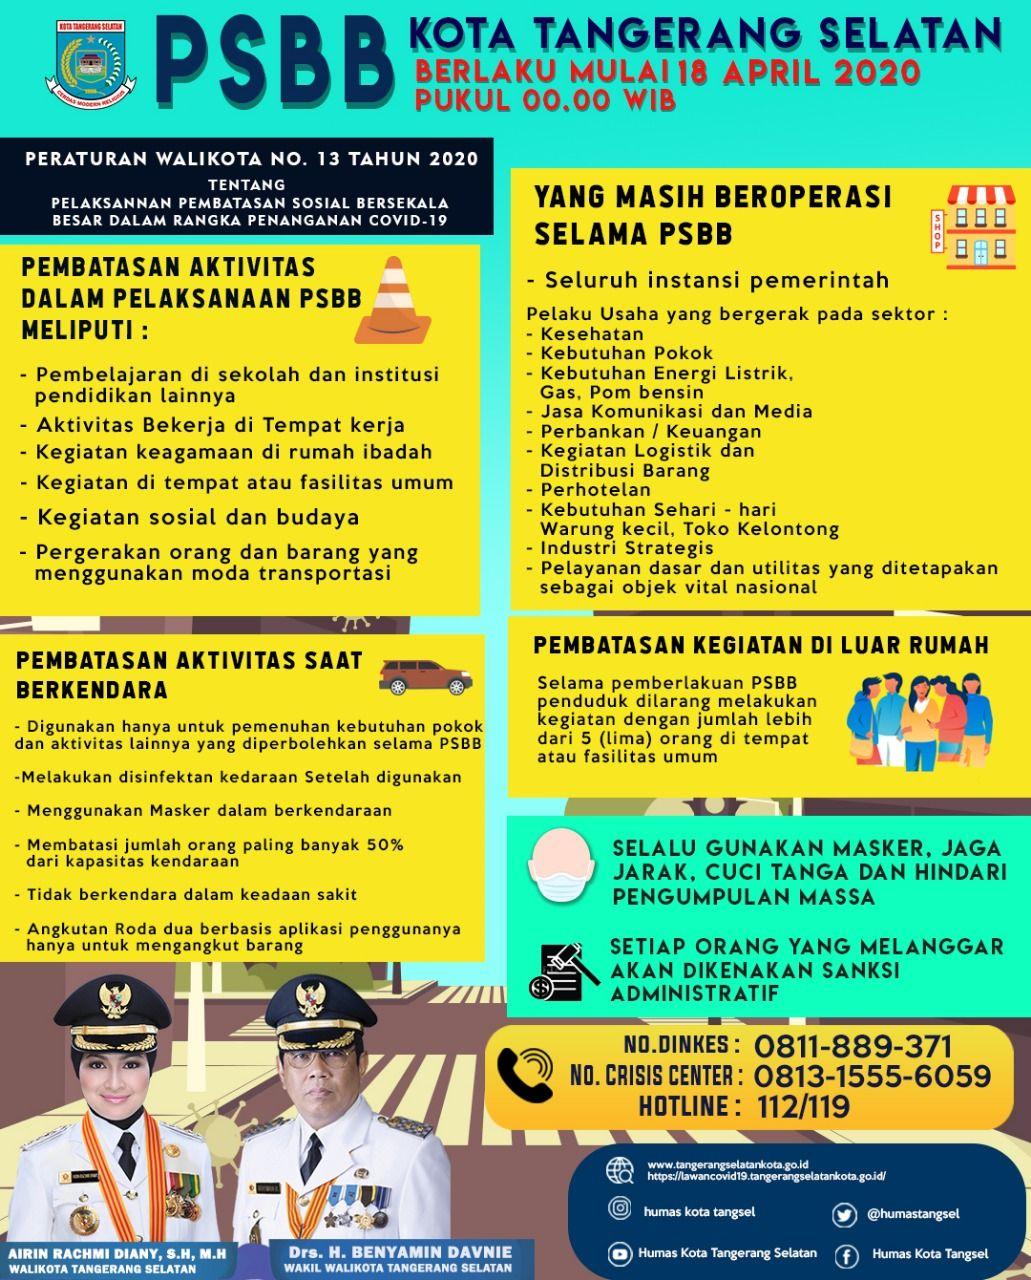 PSBB Kota Tangerang Selatan